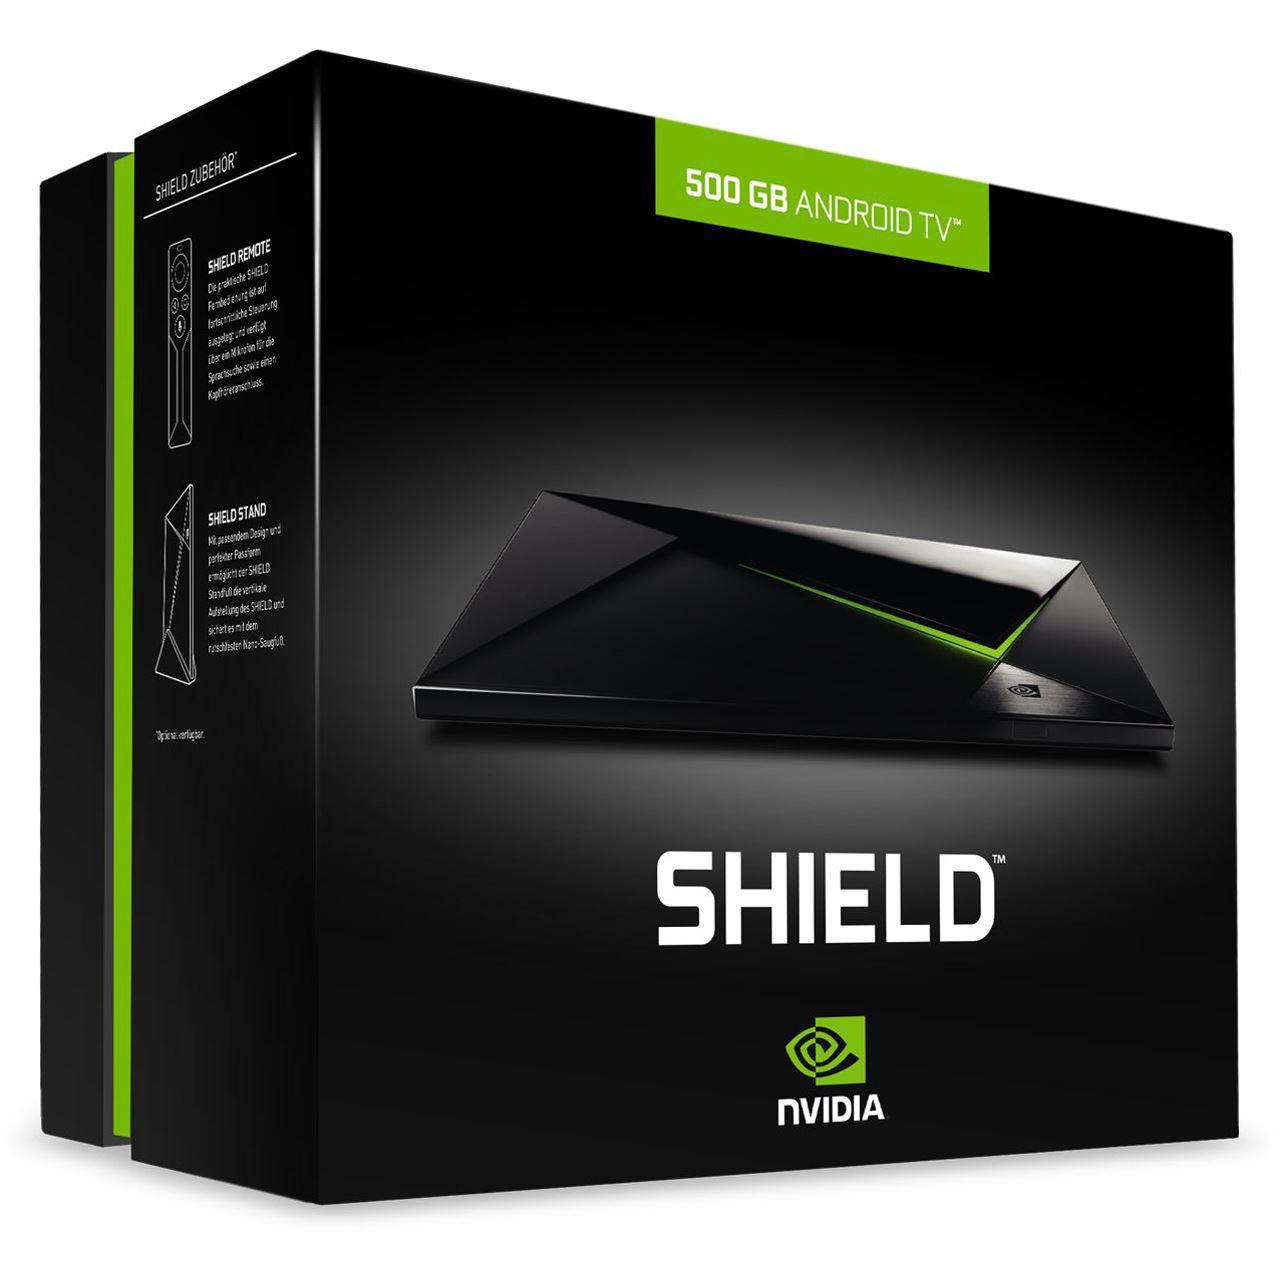 Nvidia Shield Technische Daten